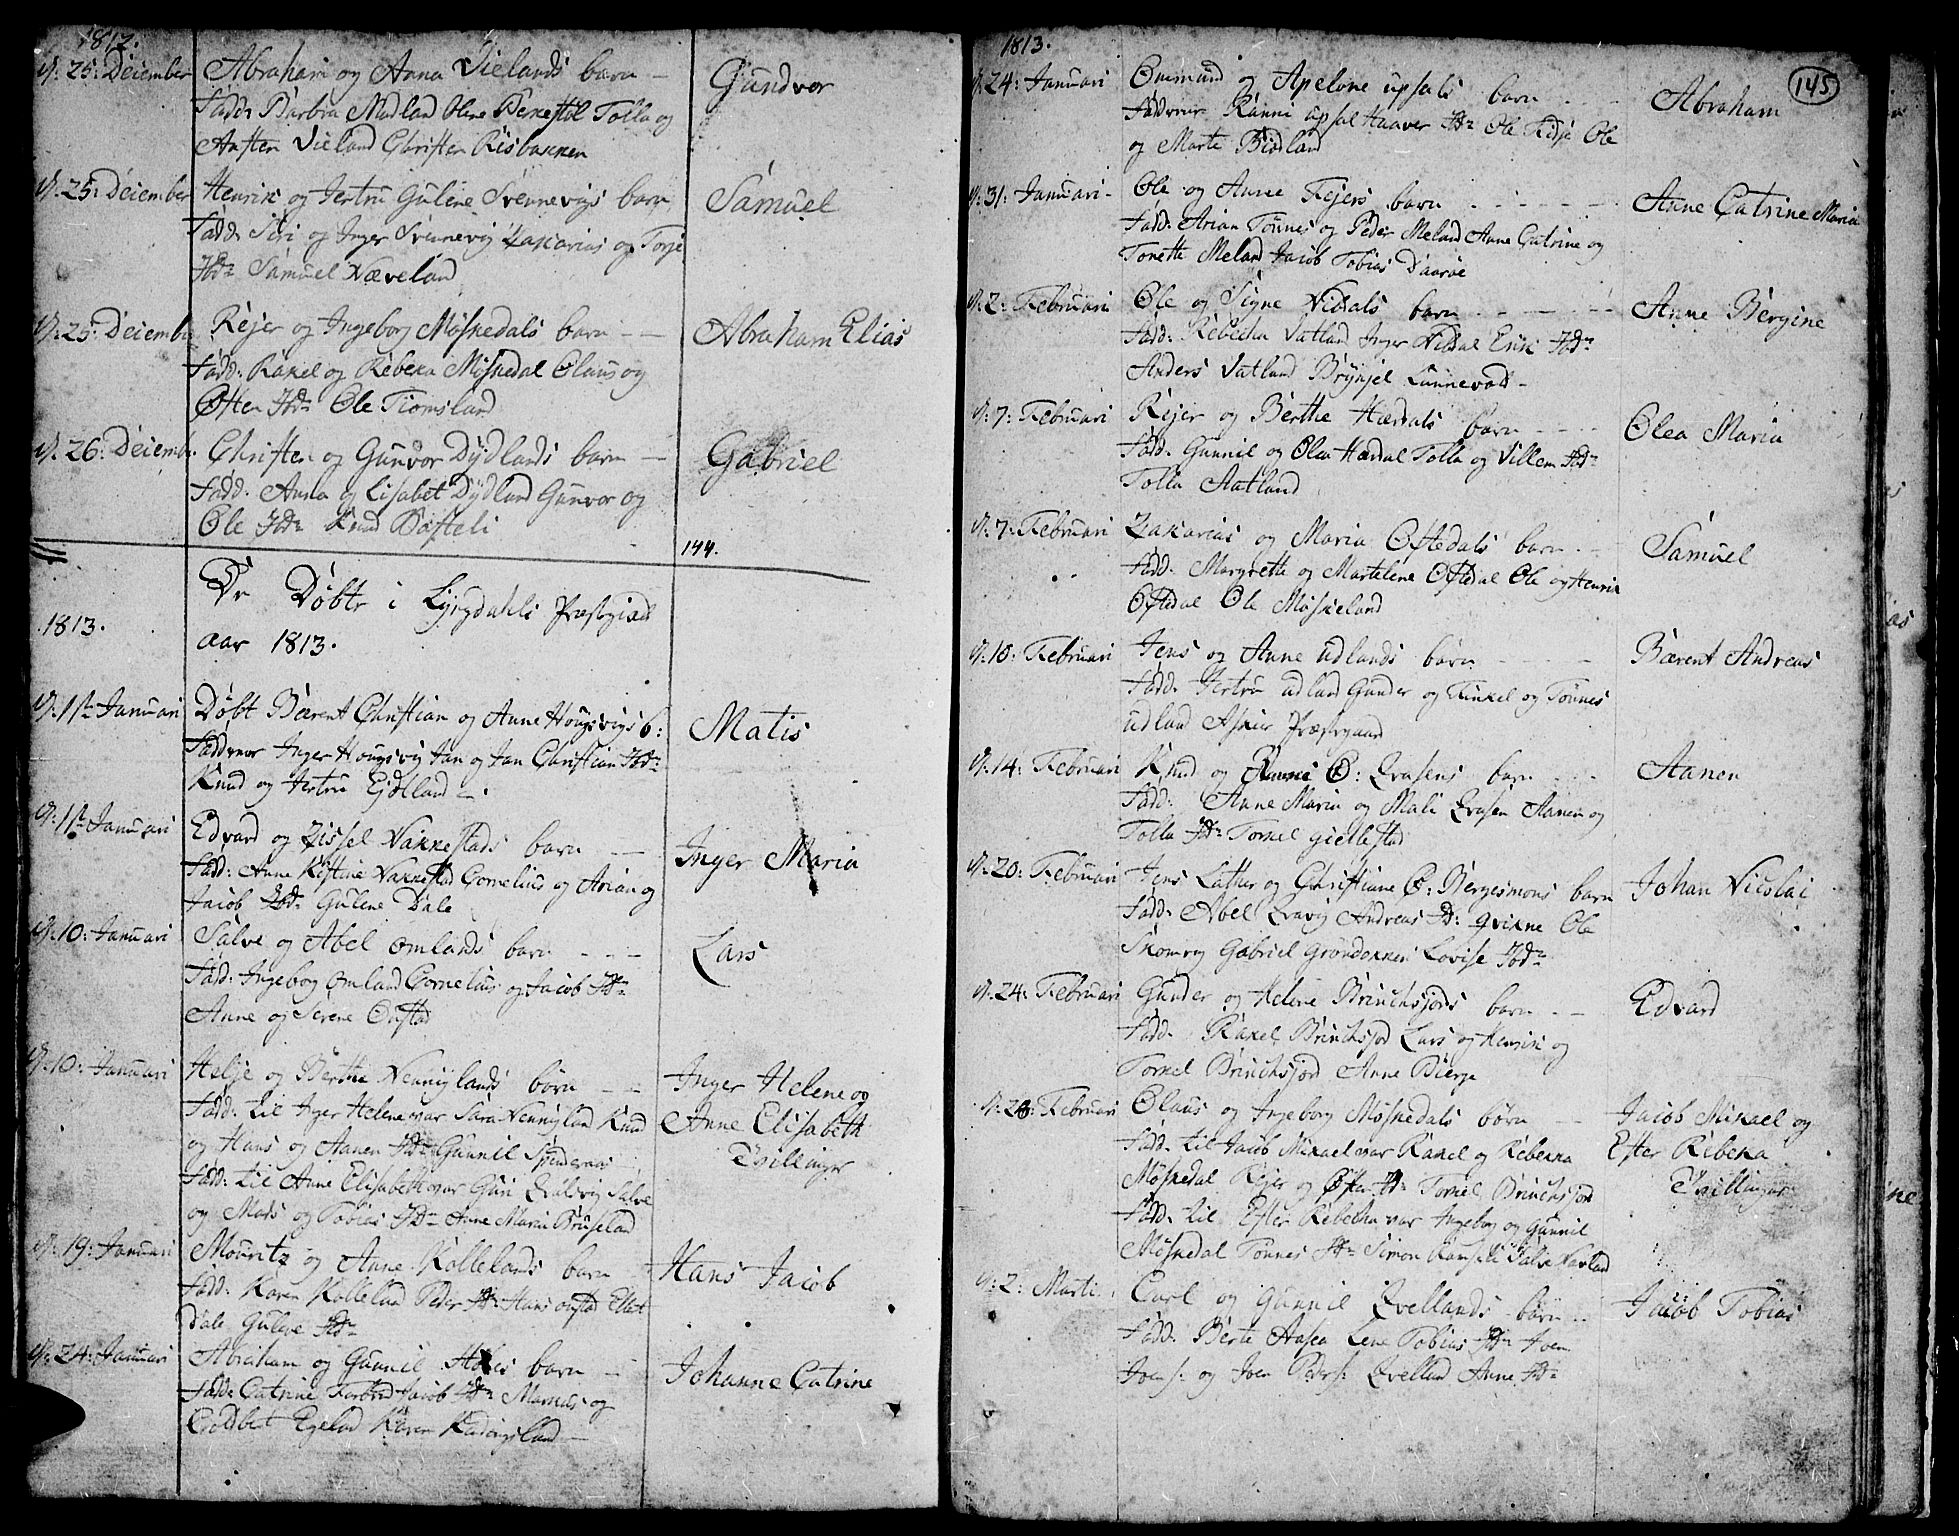 SAK, Lyngdal sokneprestkontor, F/Fa/Fac/L0004: Ministerialbok nr. A 4, 1780-1815, s. 145